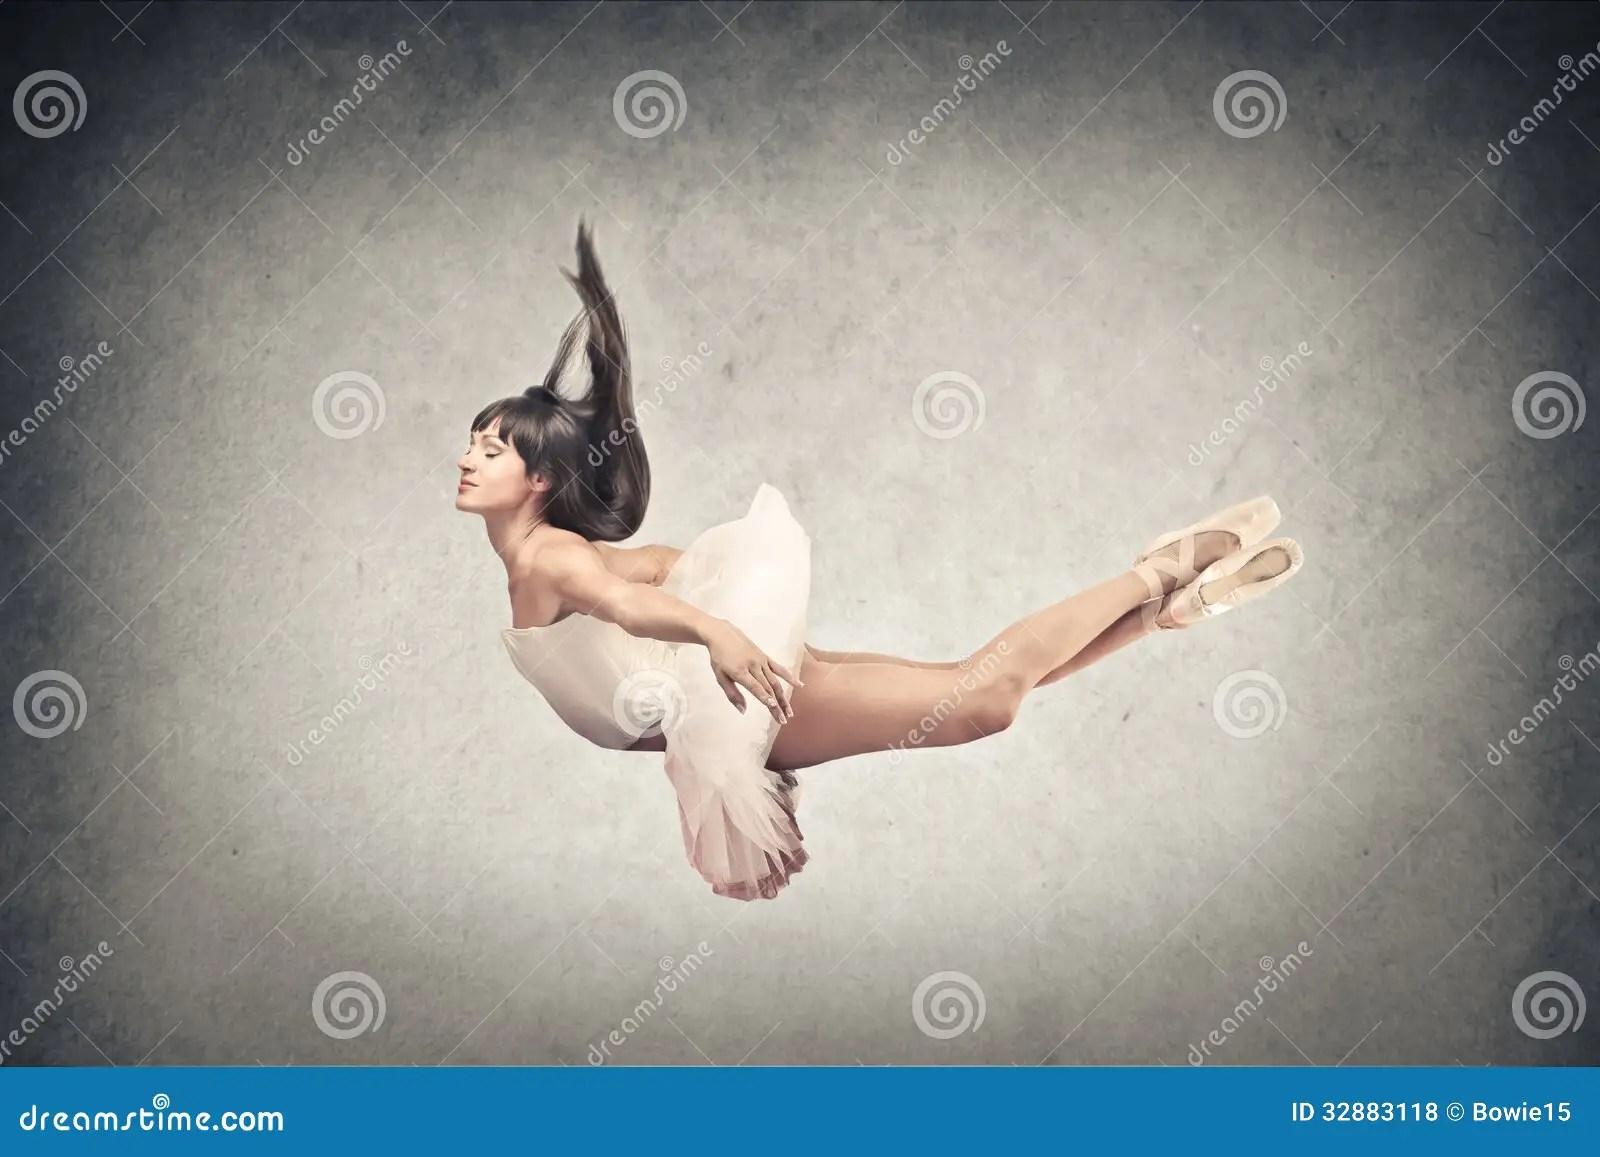 Dancer Flying Stock Photo Image Of Beautiful Wall Fall